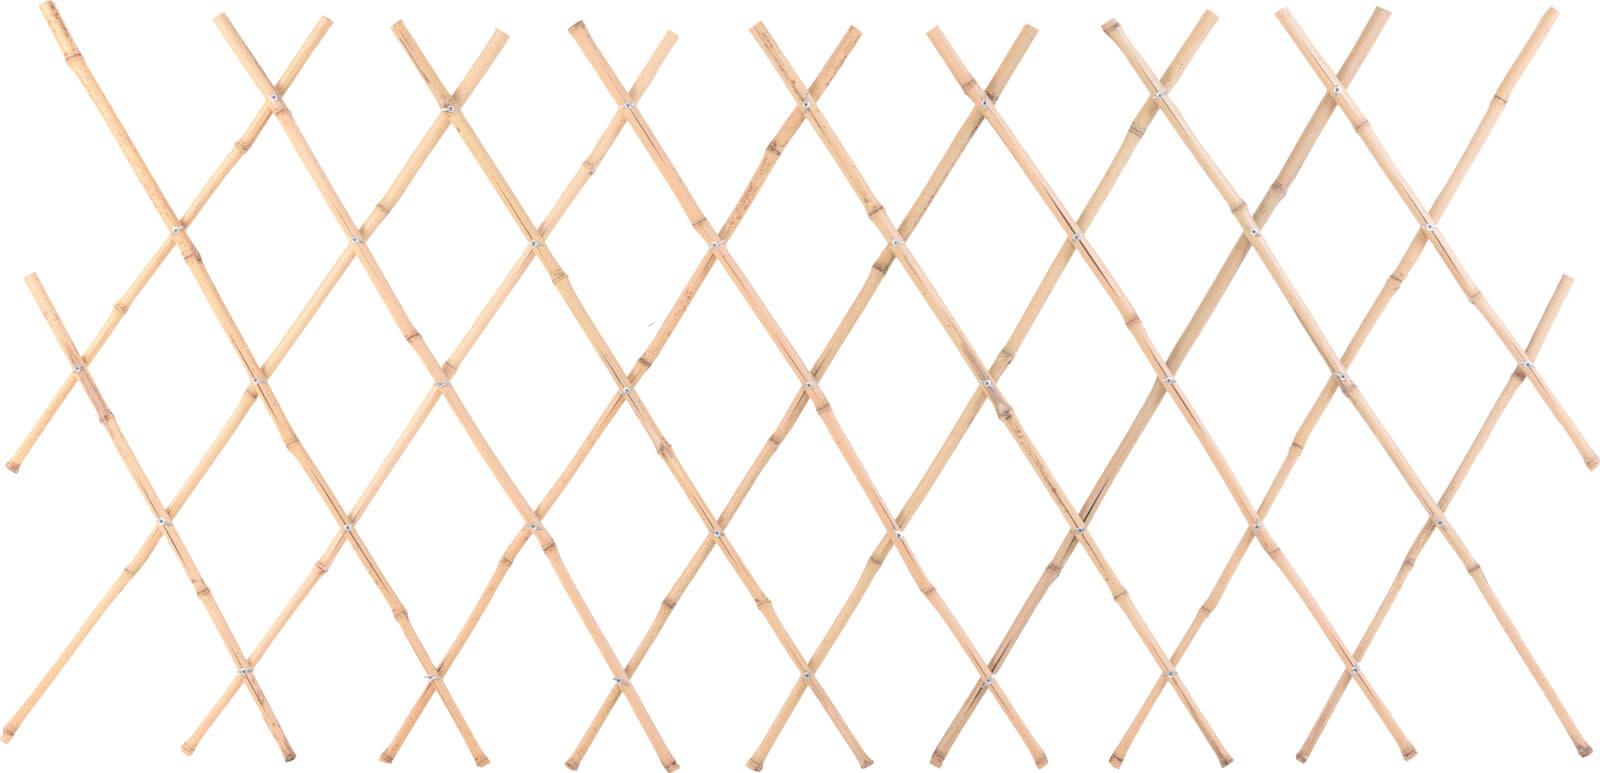 Koopman Bamboo Fence For Plants